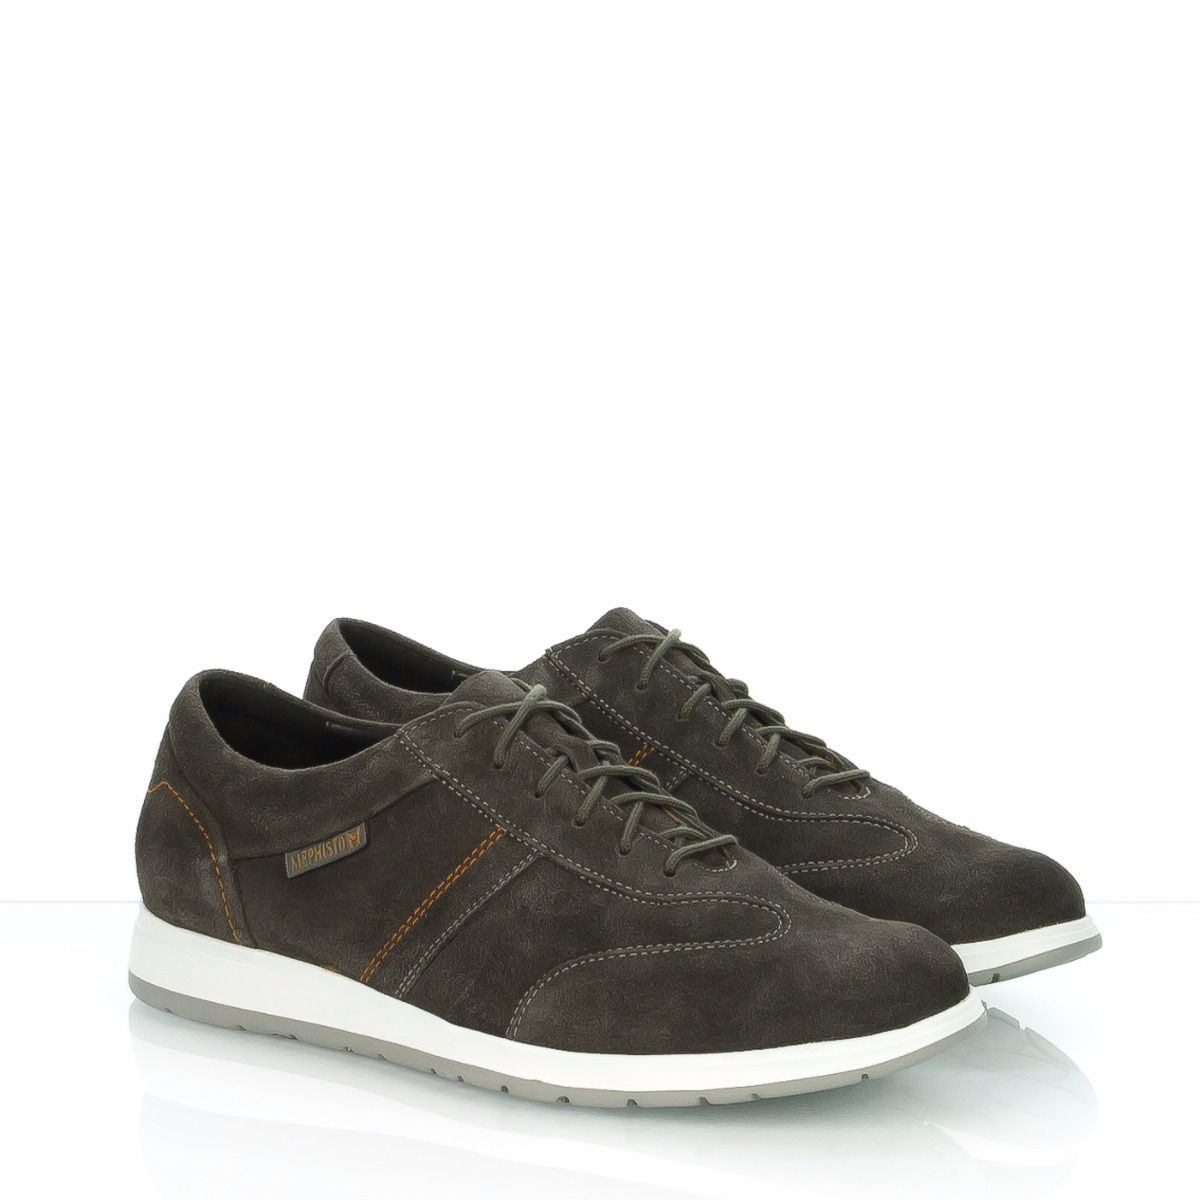 sneakers for cheap 33d6d 1b4d4 MEPHISTO SCARPA CASUAL 3652 PELLE TESTA DI MORO